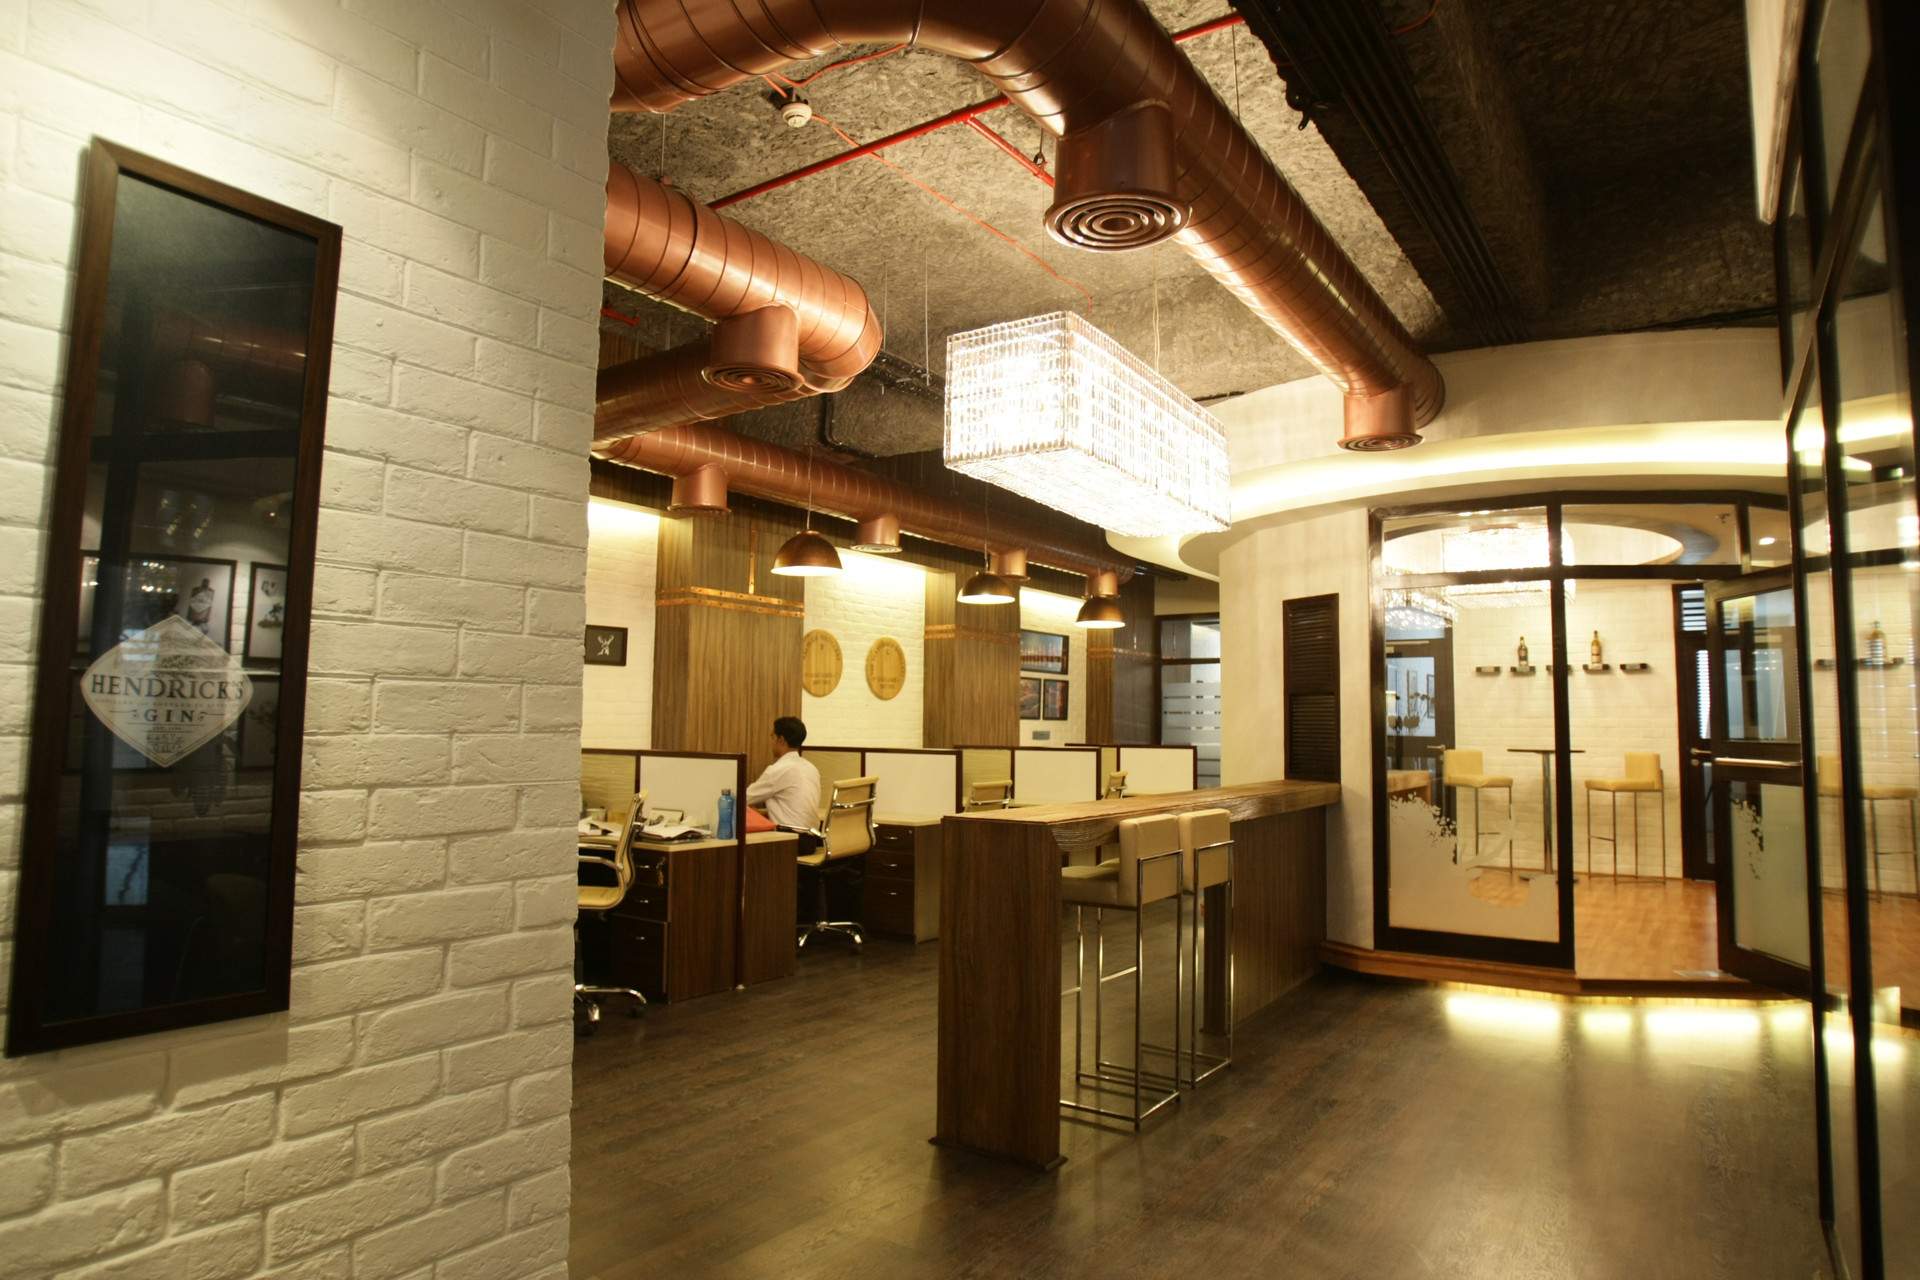 william grant corp office.JPG